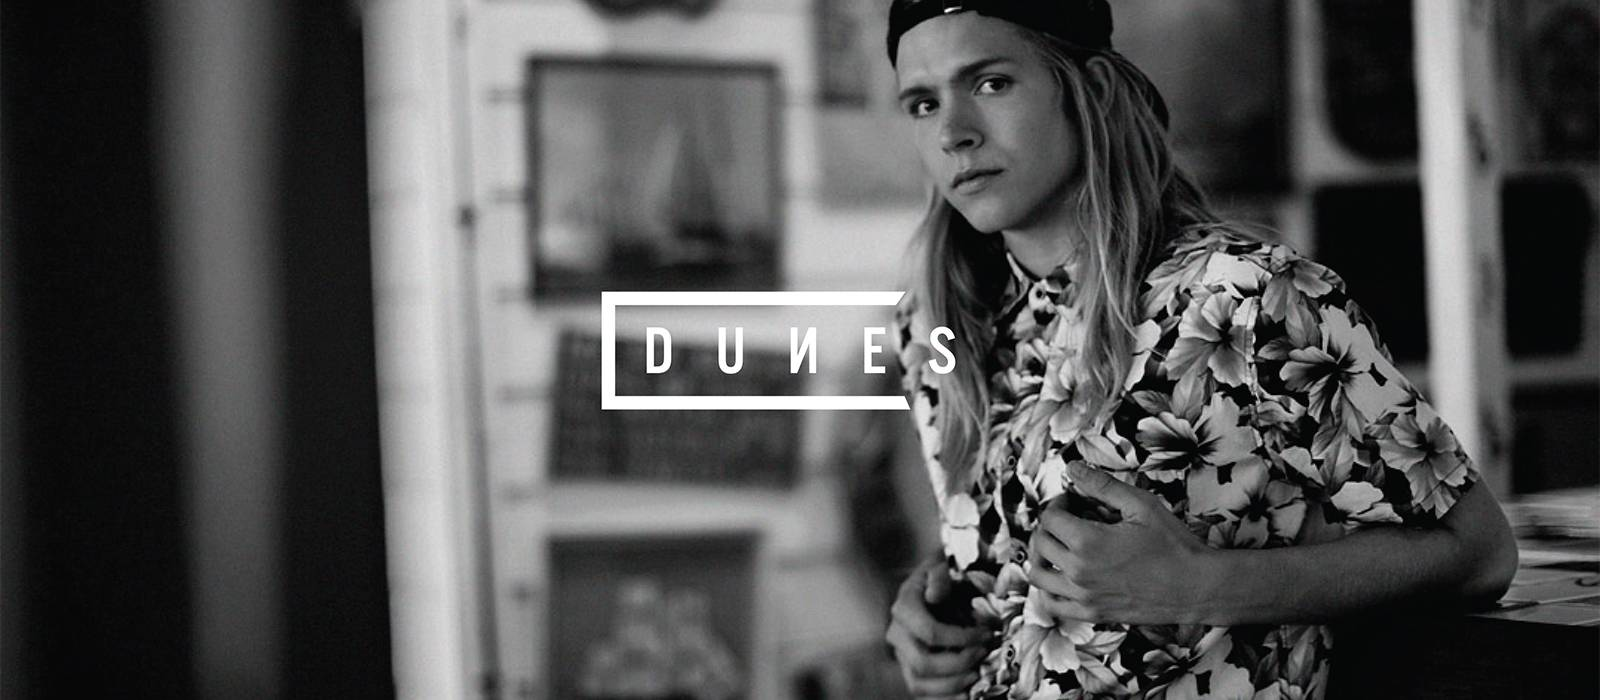 Dunes-On-Trend-2015-Look-Draft-V2